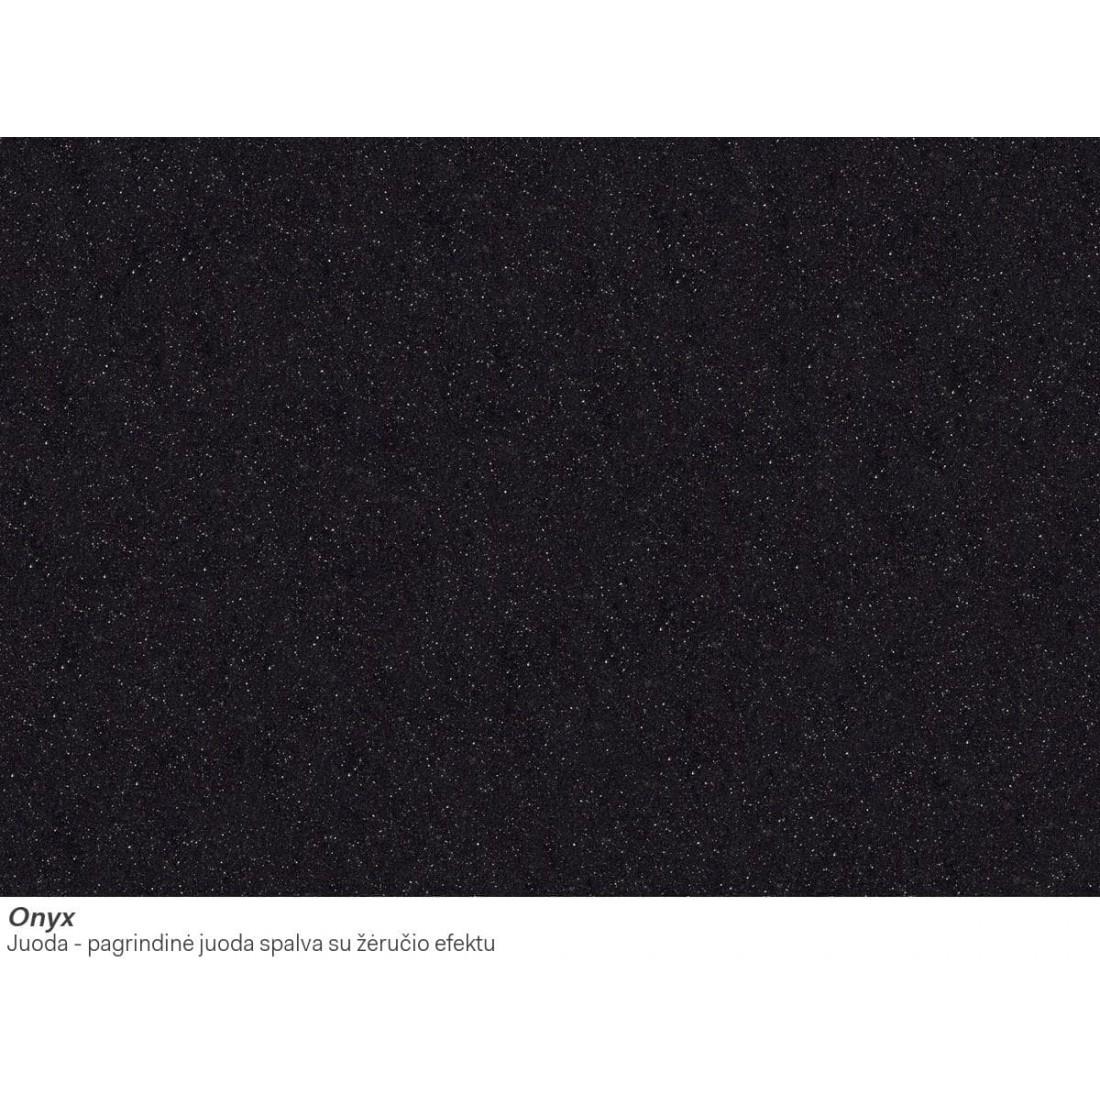 Akmens masės plautuvė Franke Mythos, MTG 651-100, Onyx, dubuo dešinėje